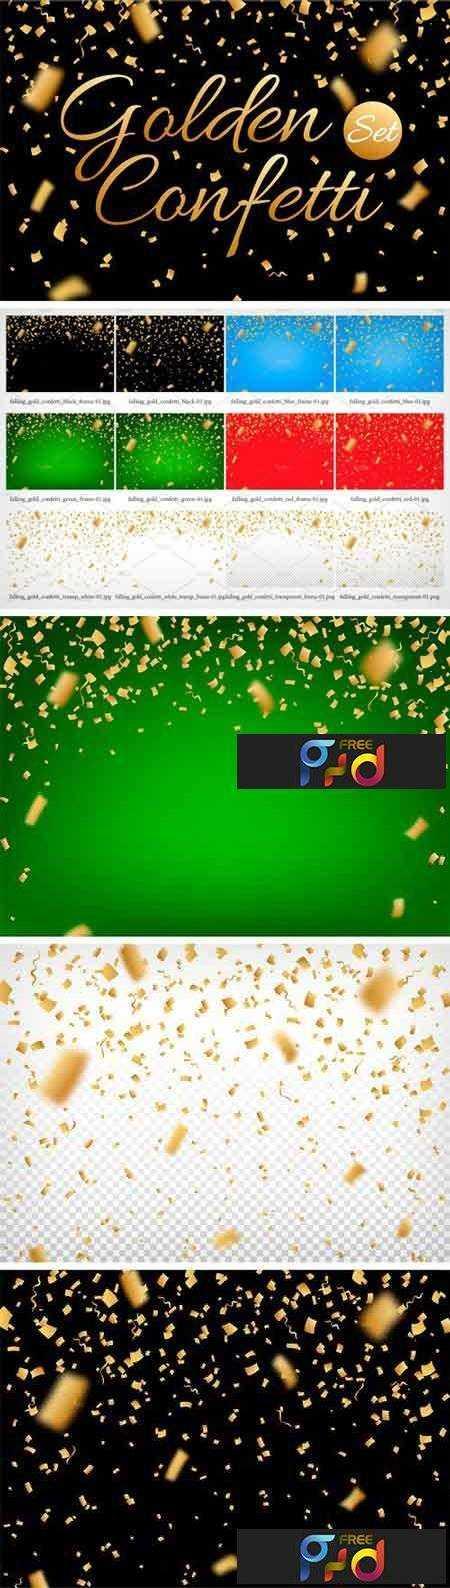 1708222 Confetti, Glitters. Vector + JPG + PNG 2053897 1